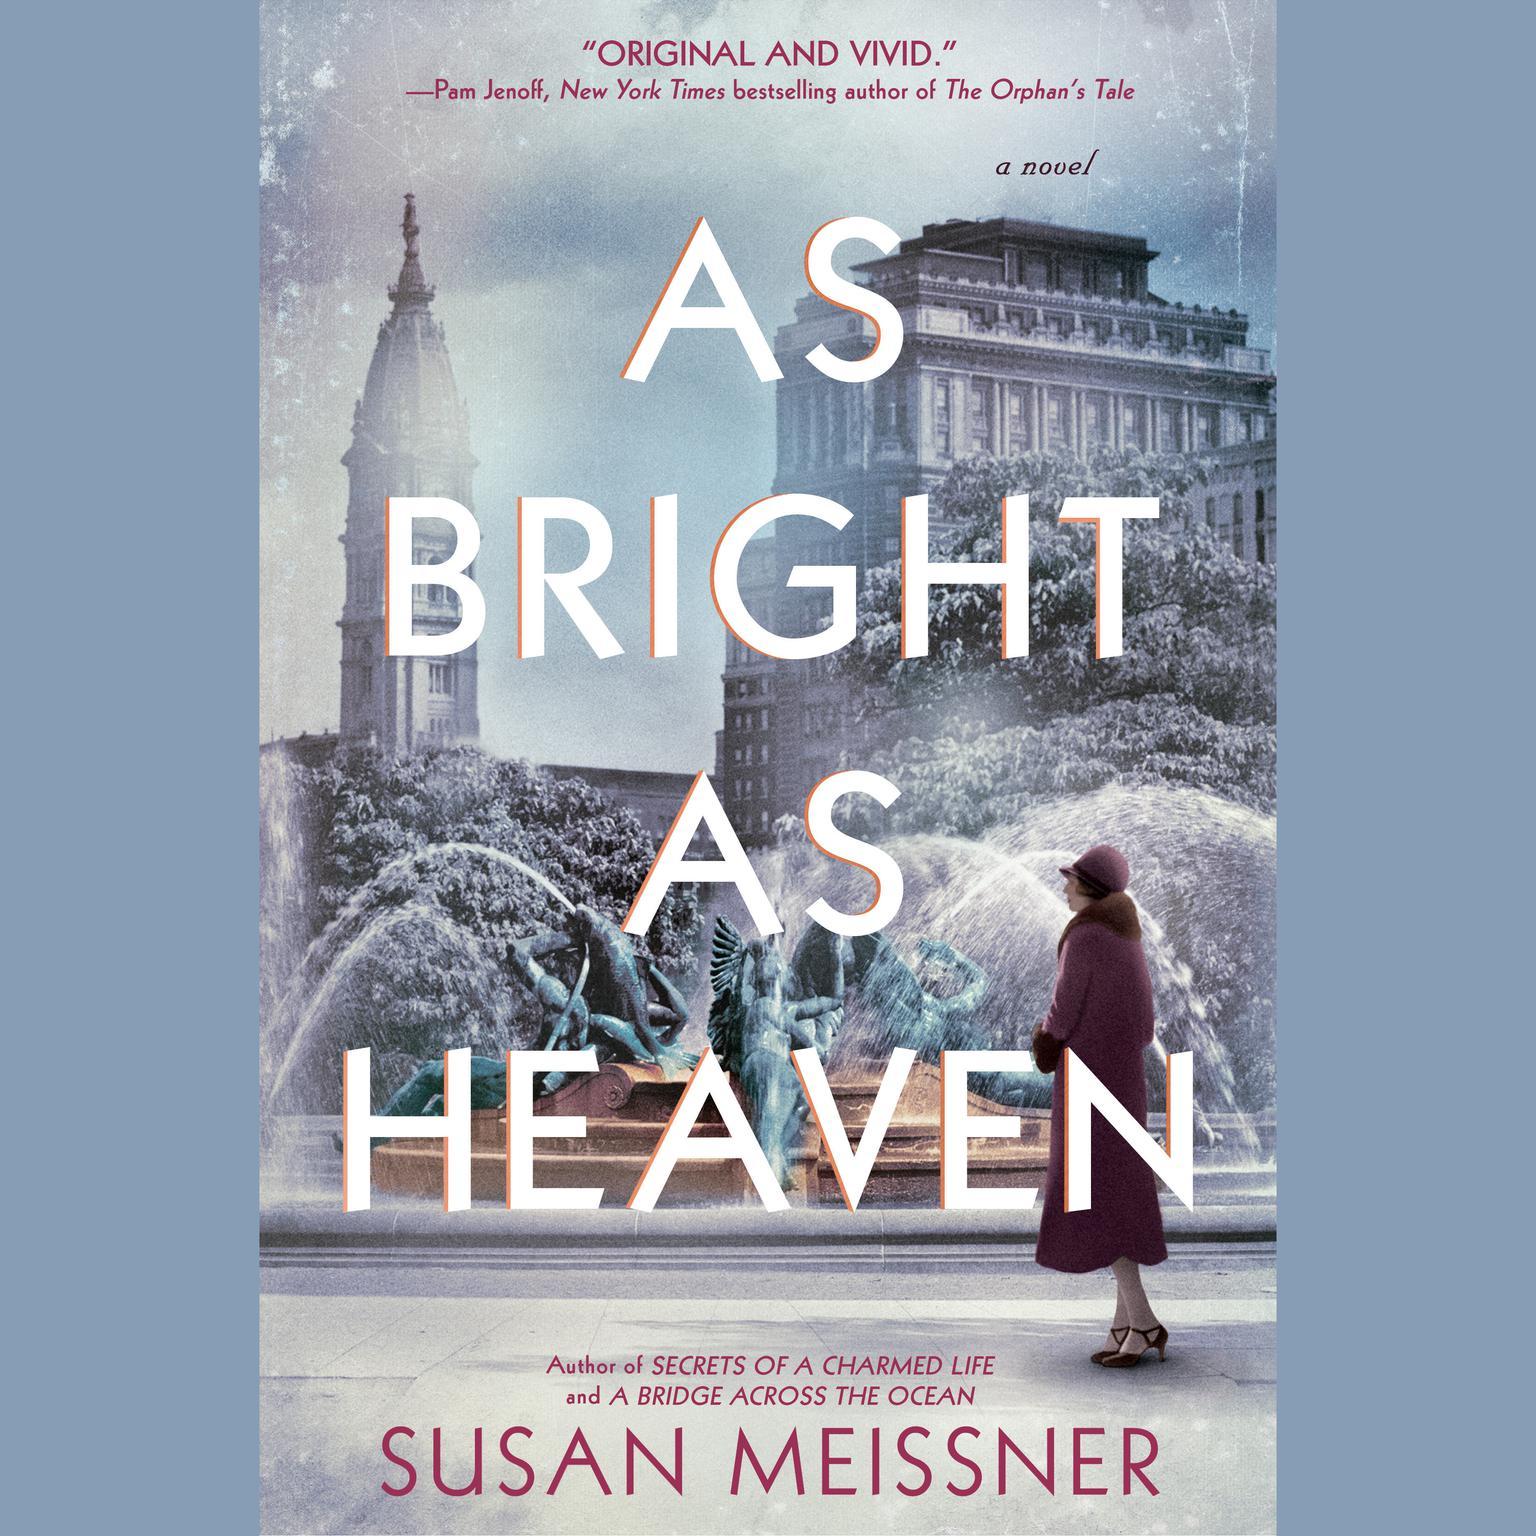 As Bright as Heaven Audiobook, by Susan Meissner